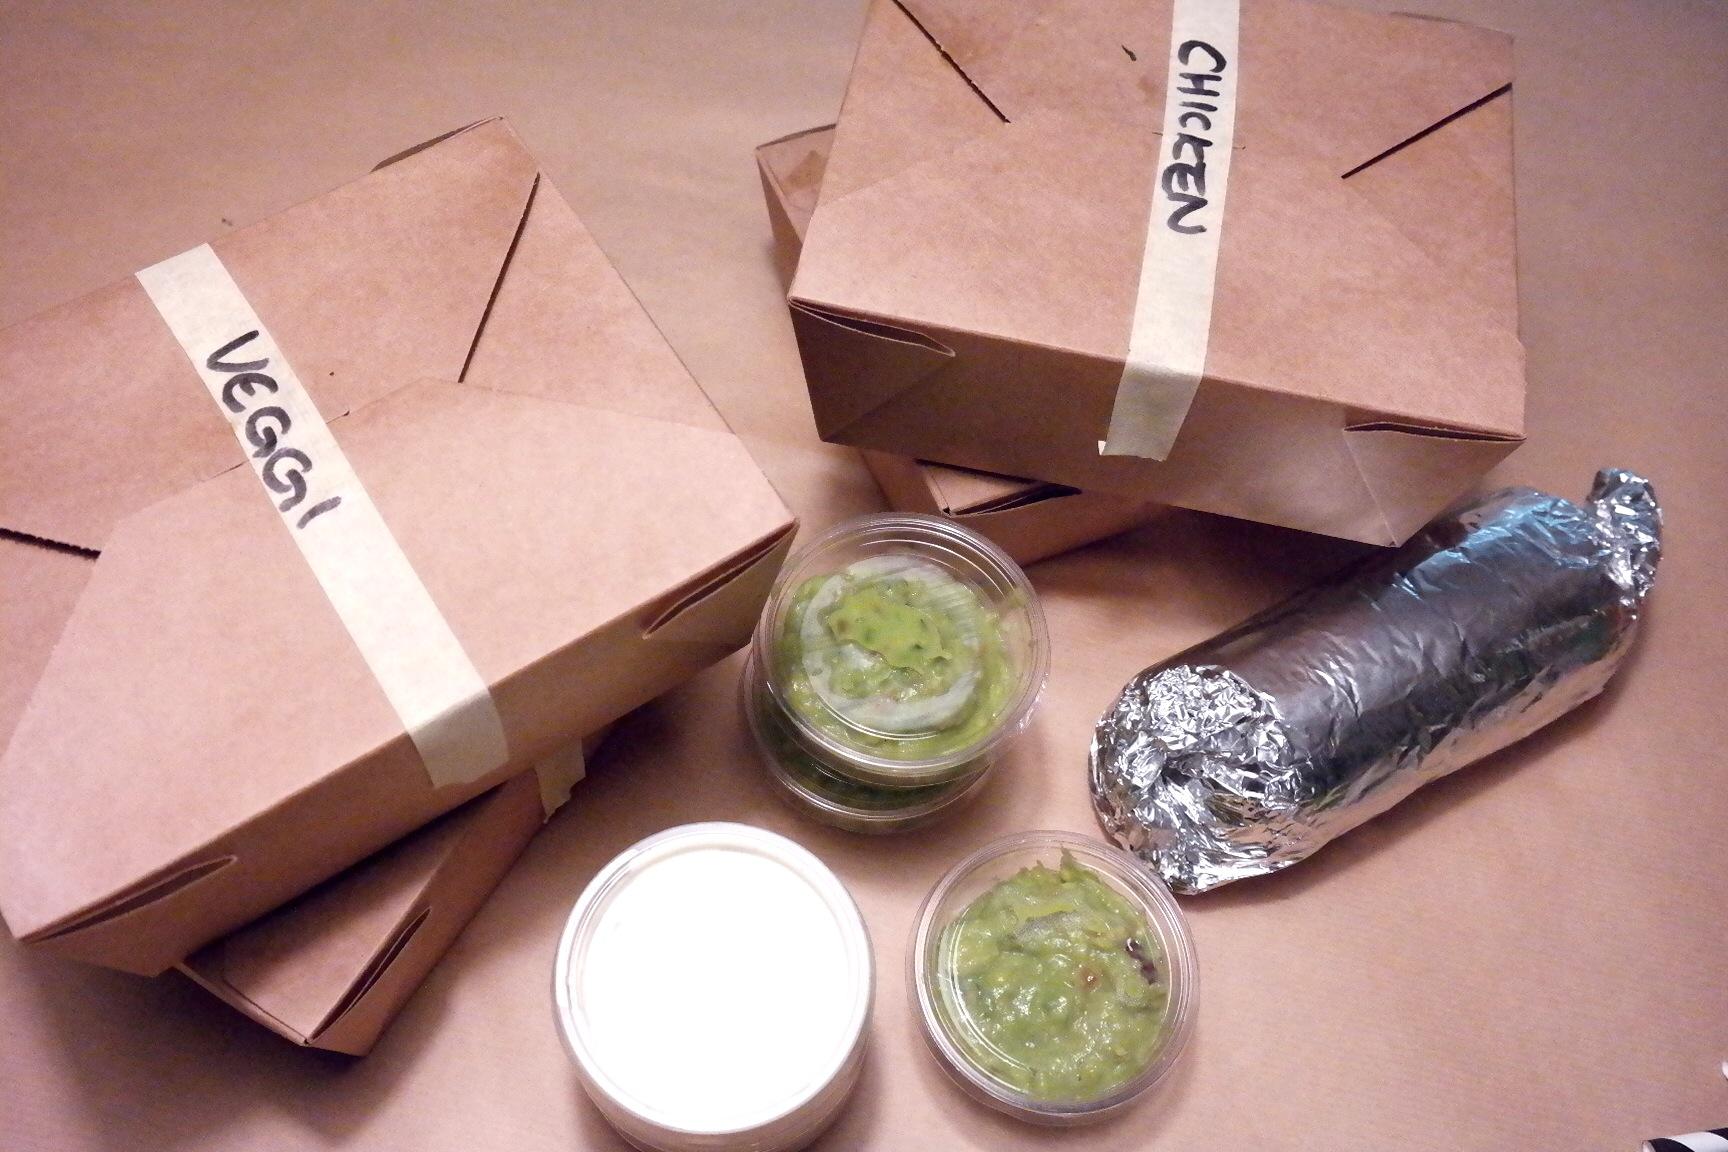 Burrito rico bonn bachelor m delsabend foodora lieferservice bonn erfahrung empfehlung burrito for Lieferservice bonn